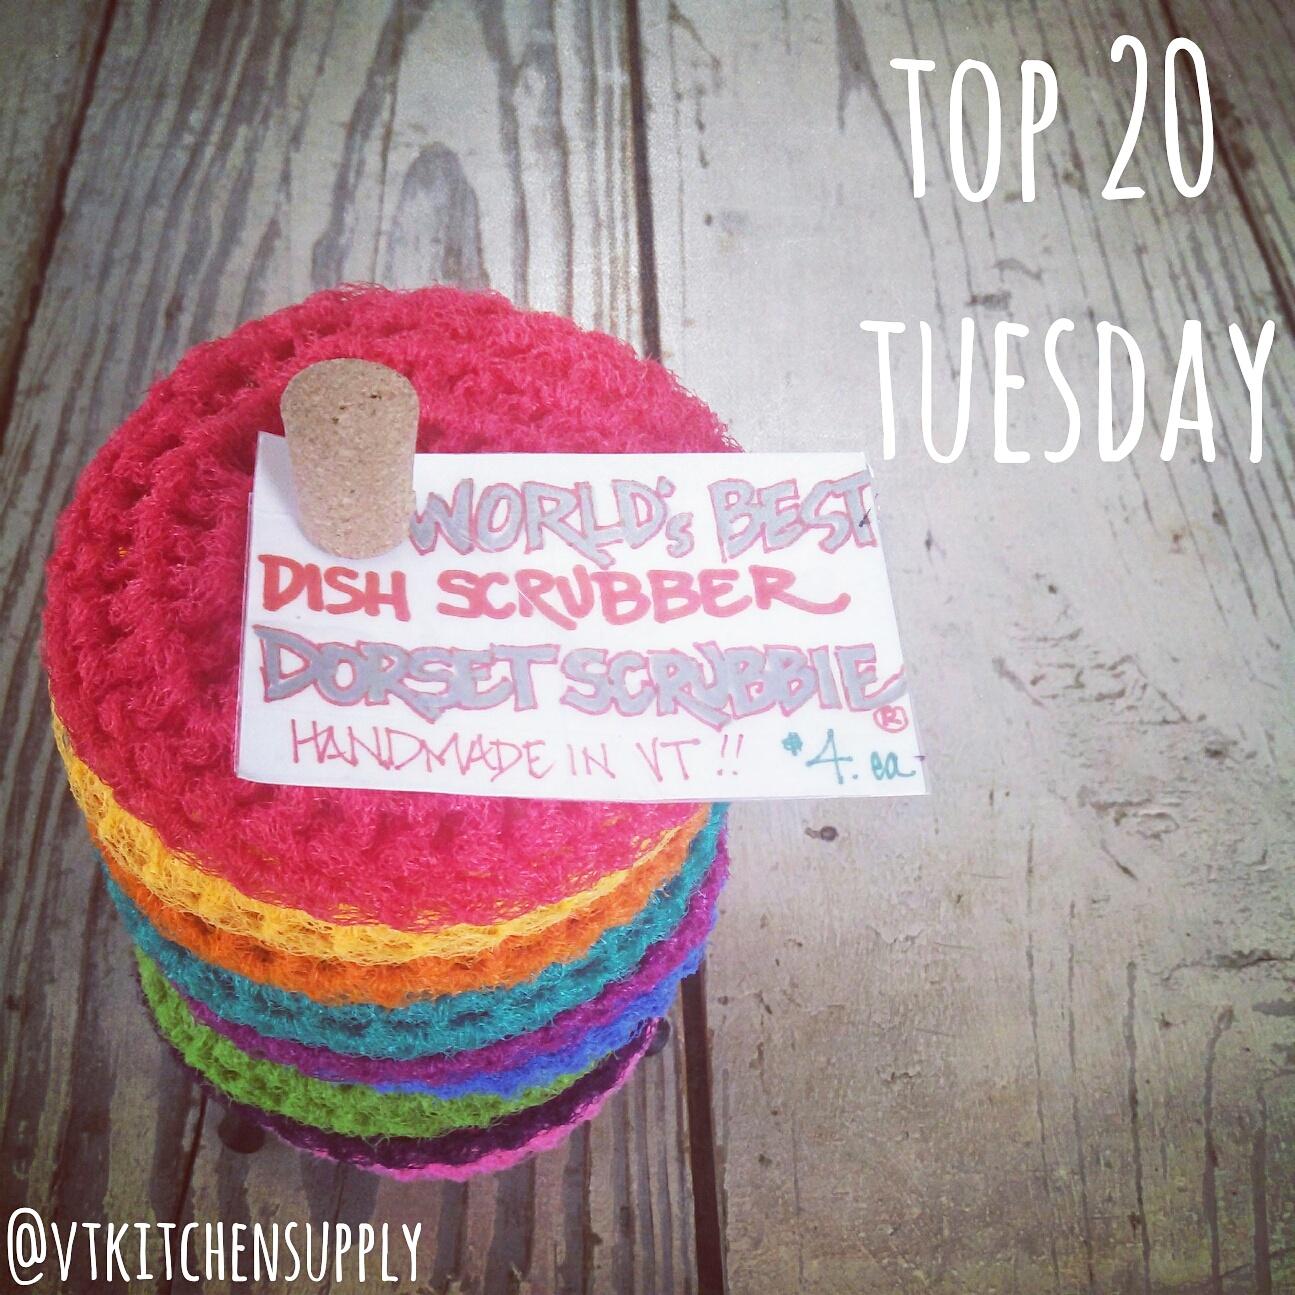 Top 20 Tuesday | Dorset Scrubbie